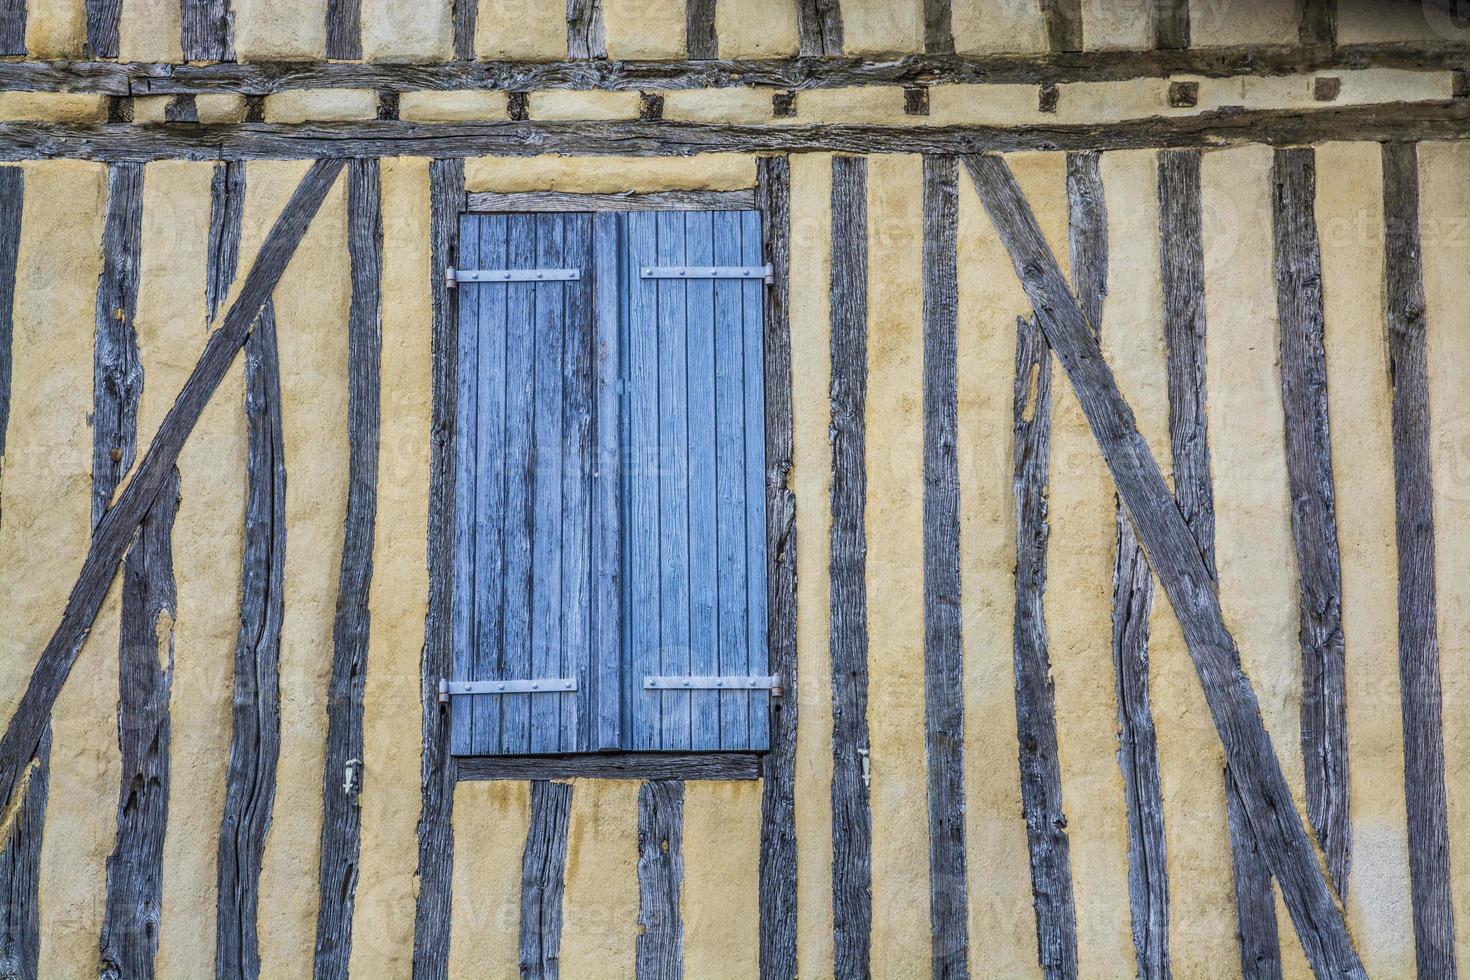 antigua muralla con persianas cercanas foto